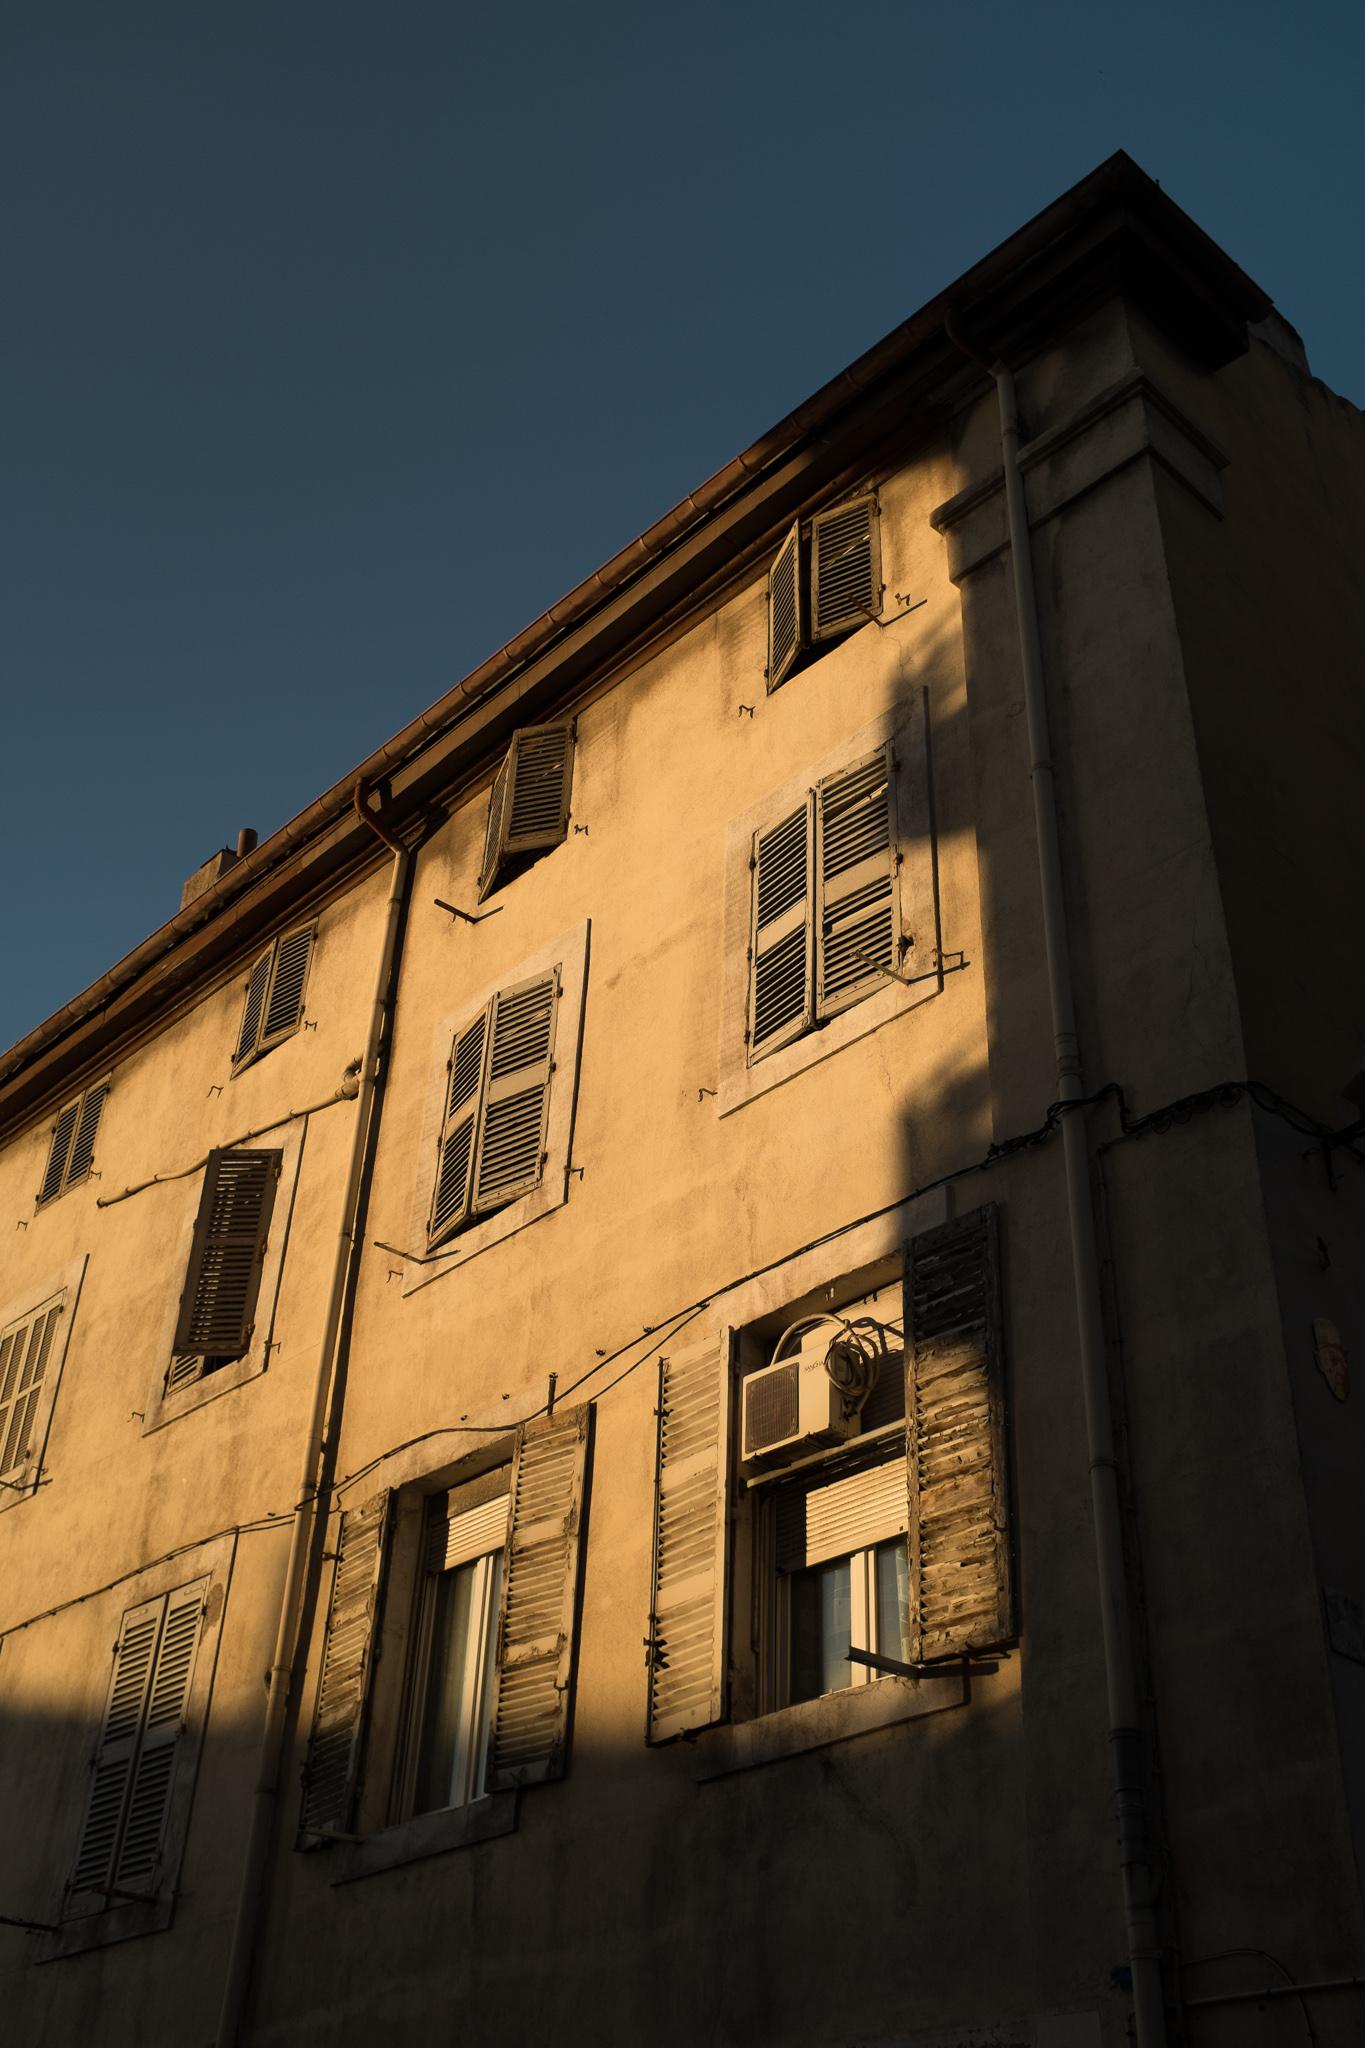 2750-urban-provence-marseille-sunset.jpg